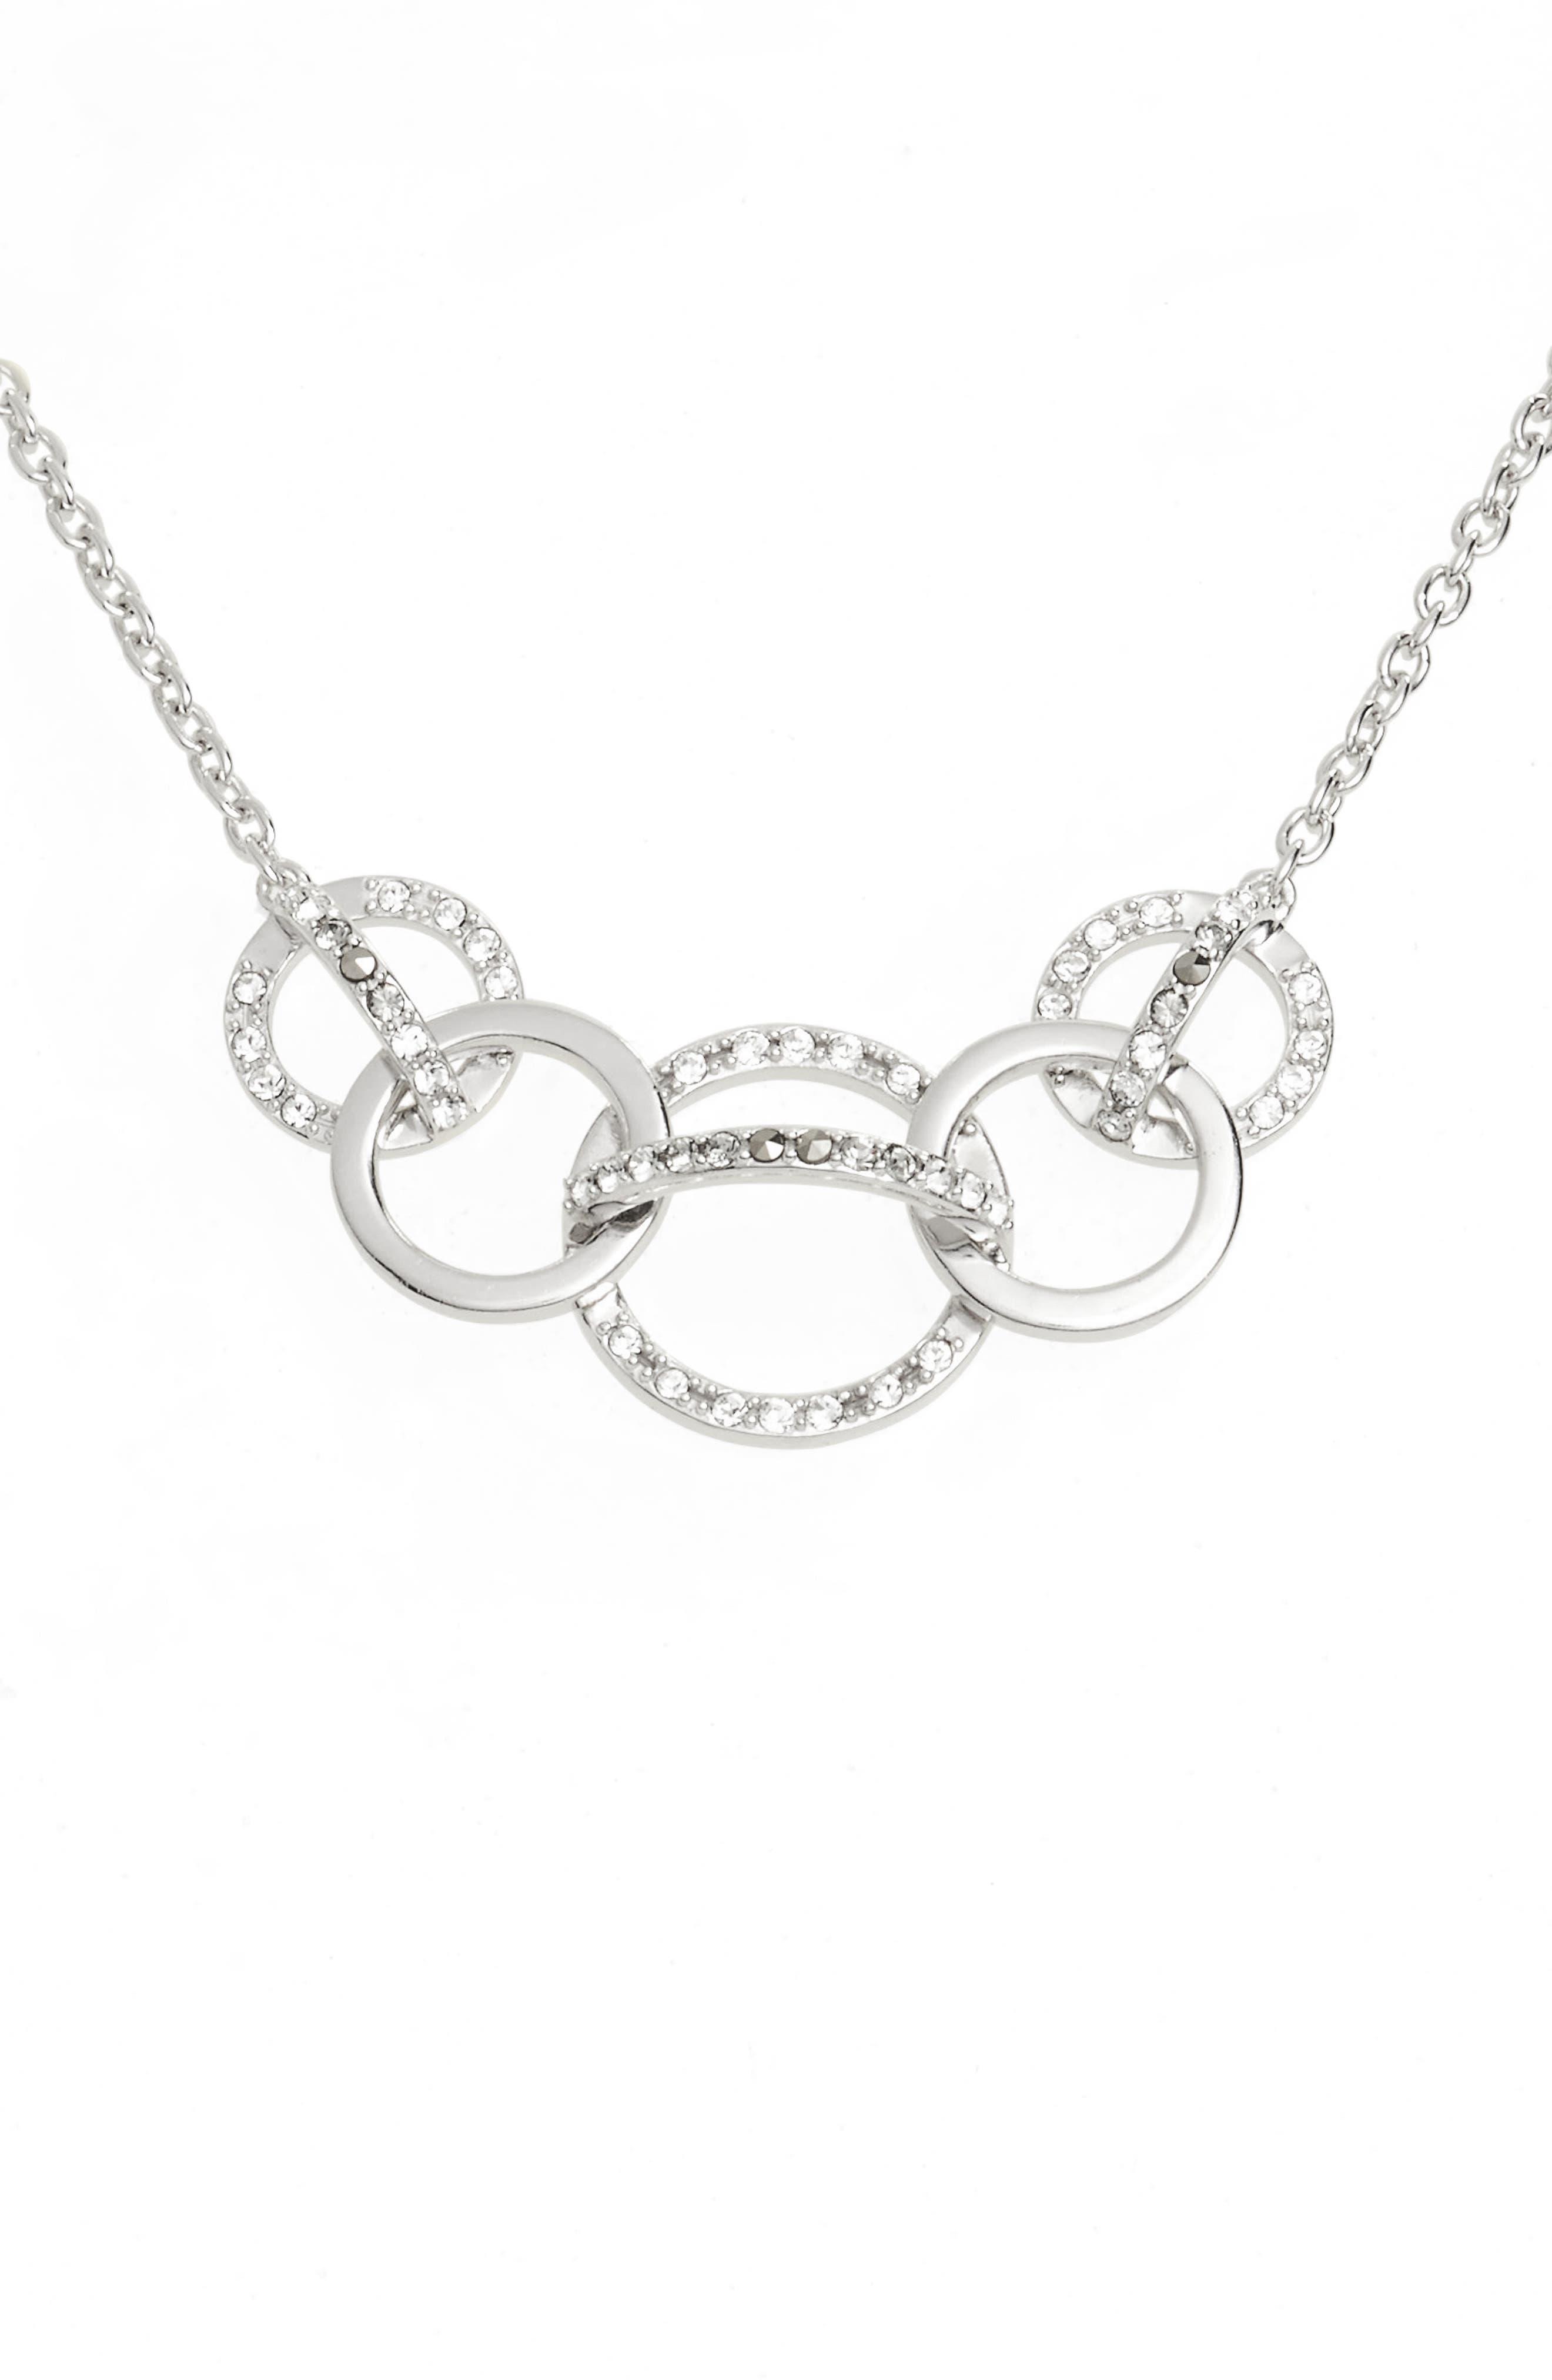 Silver Sparkle Crystal Collar Necklace,                         Main,                         color, Black Diamond/ Marcasite